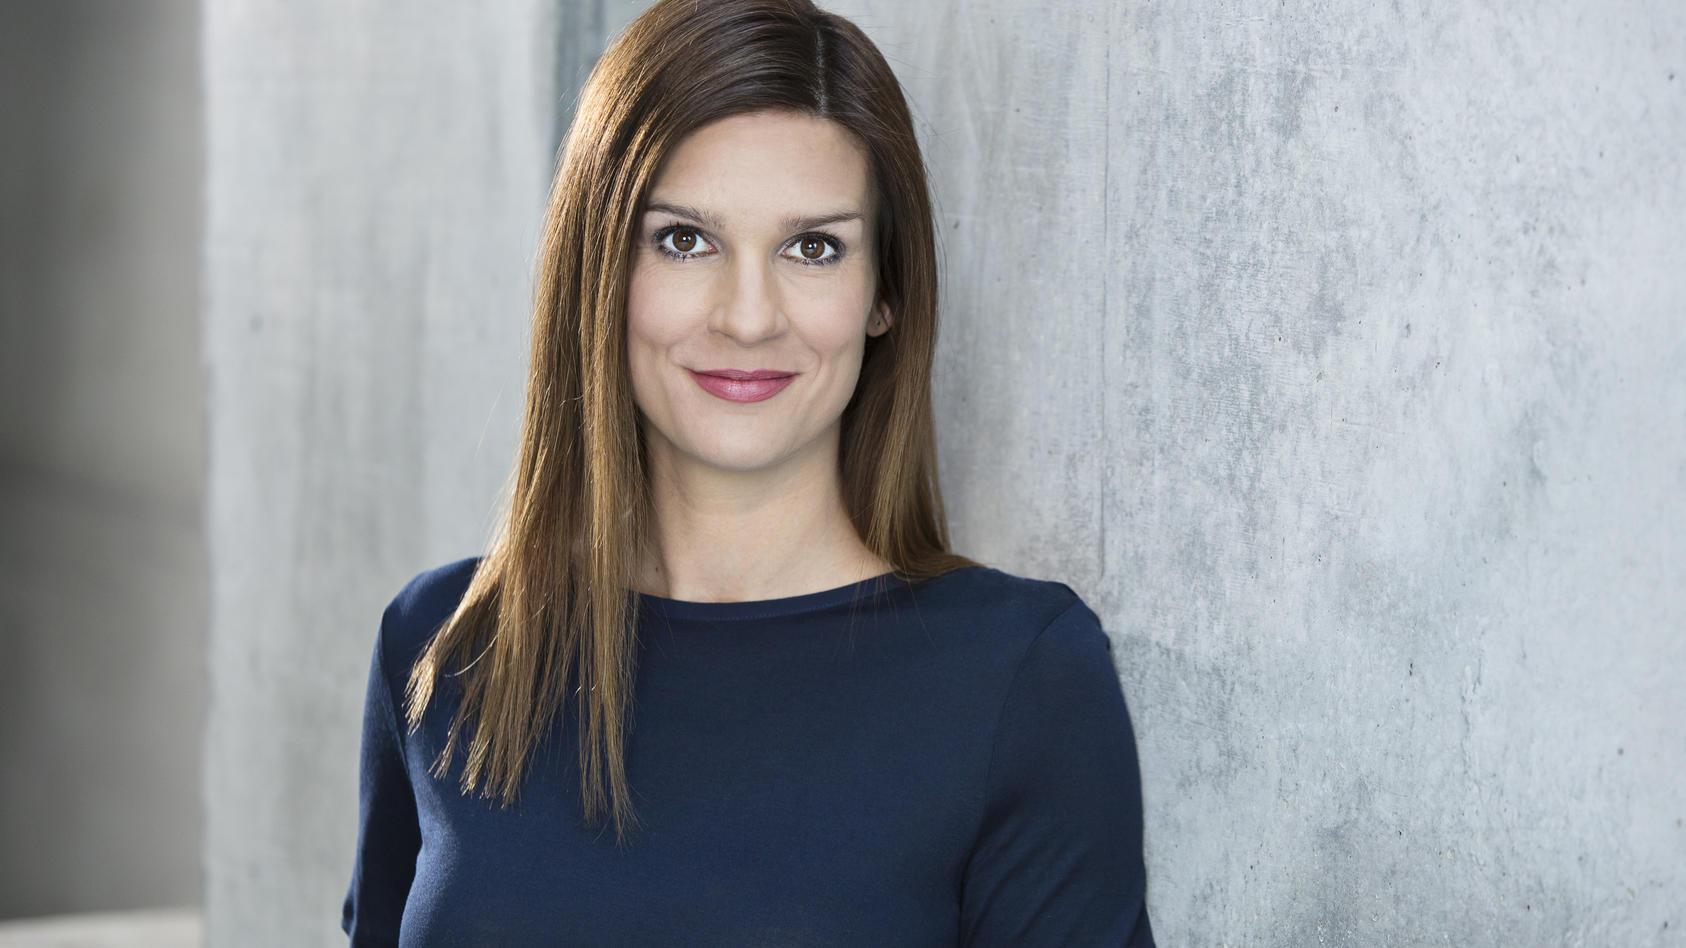 Unsere Modereatorin: Tina Mattick